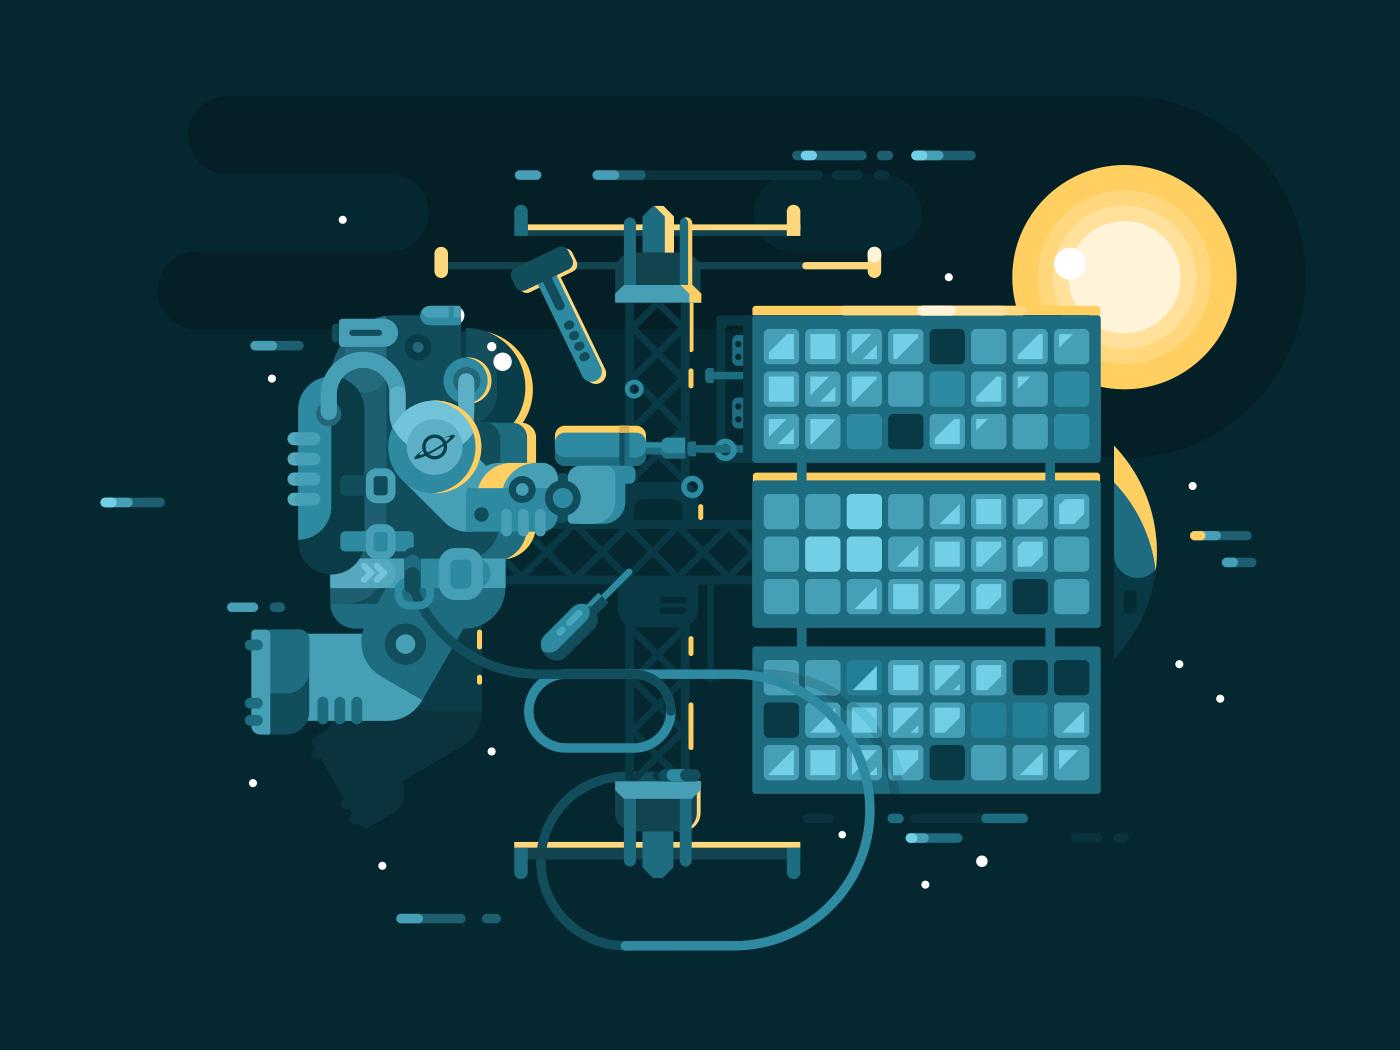 Astronaut repairing in space flat vector illustration